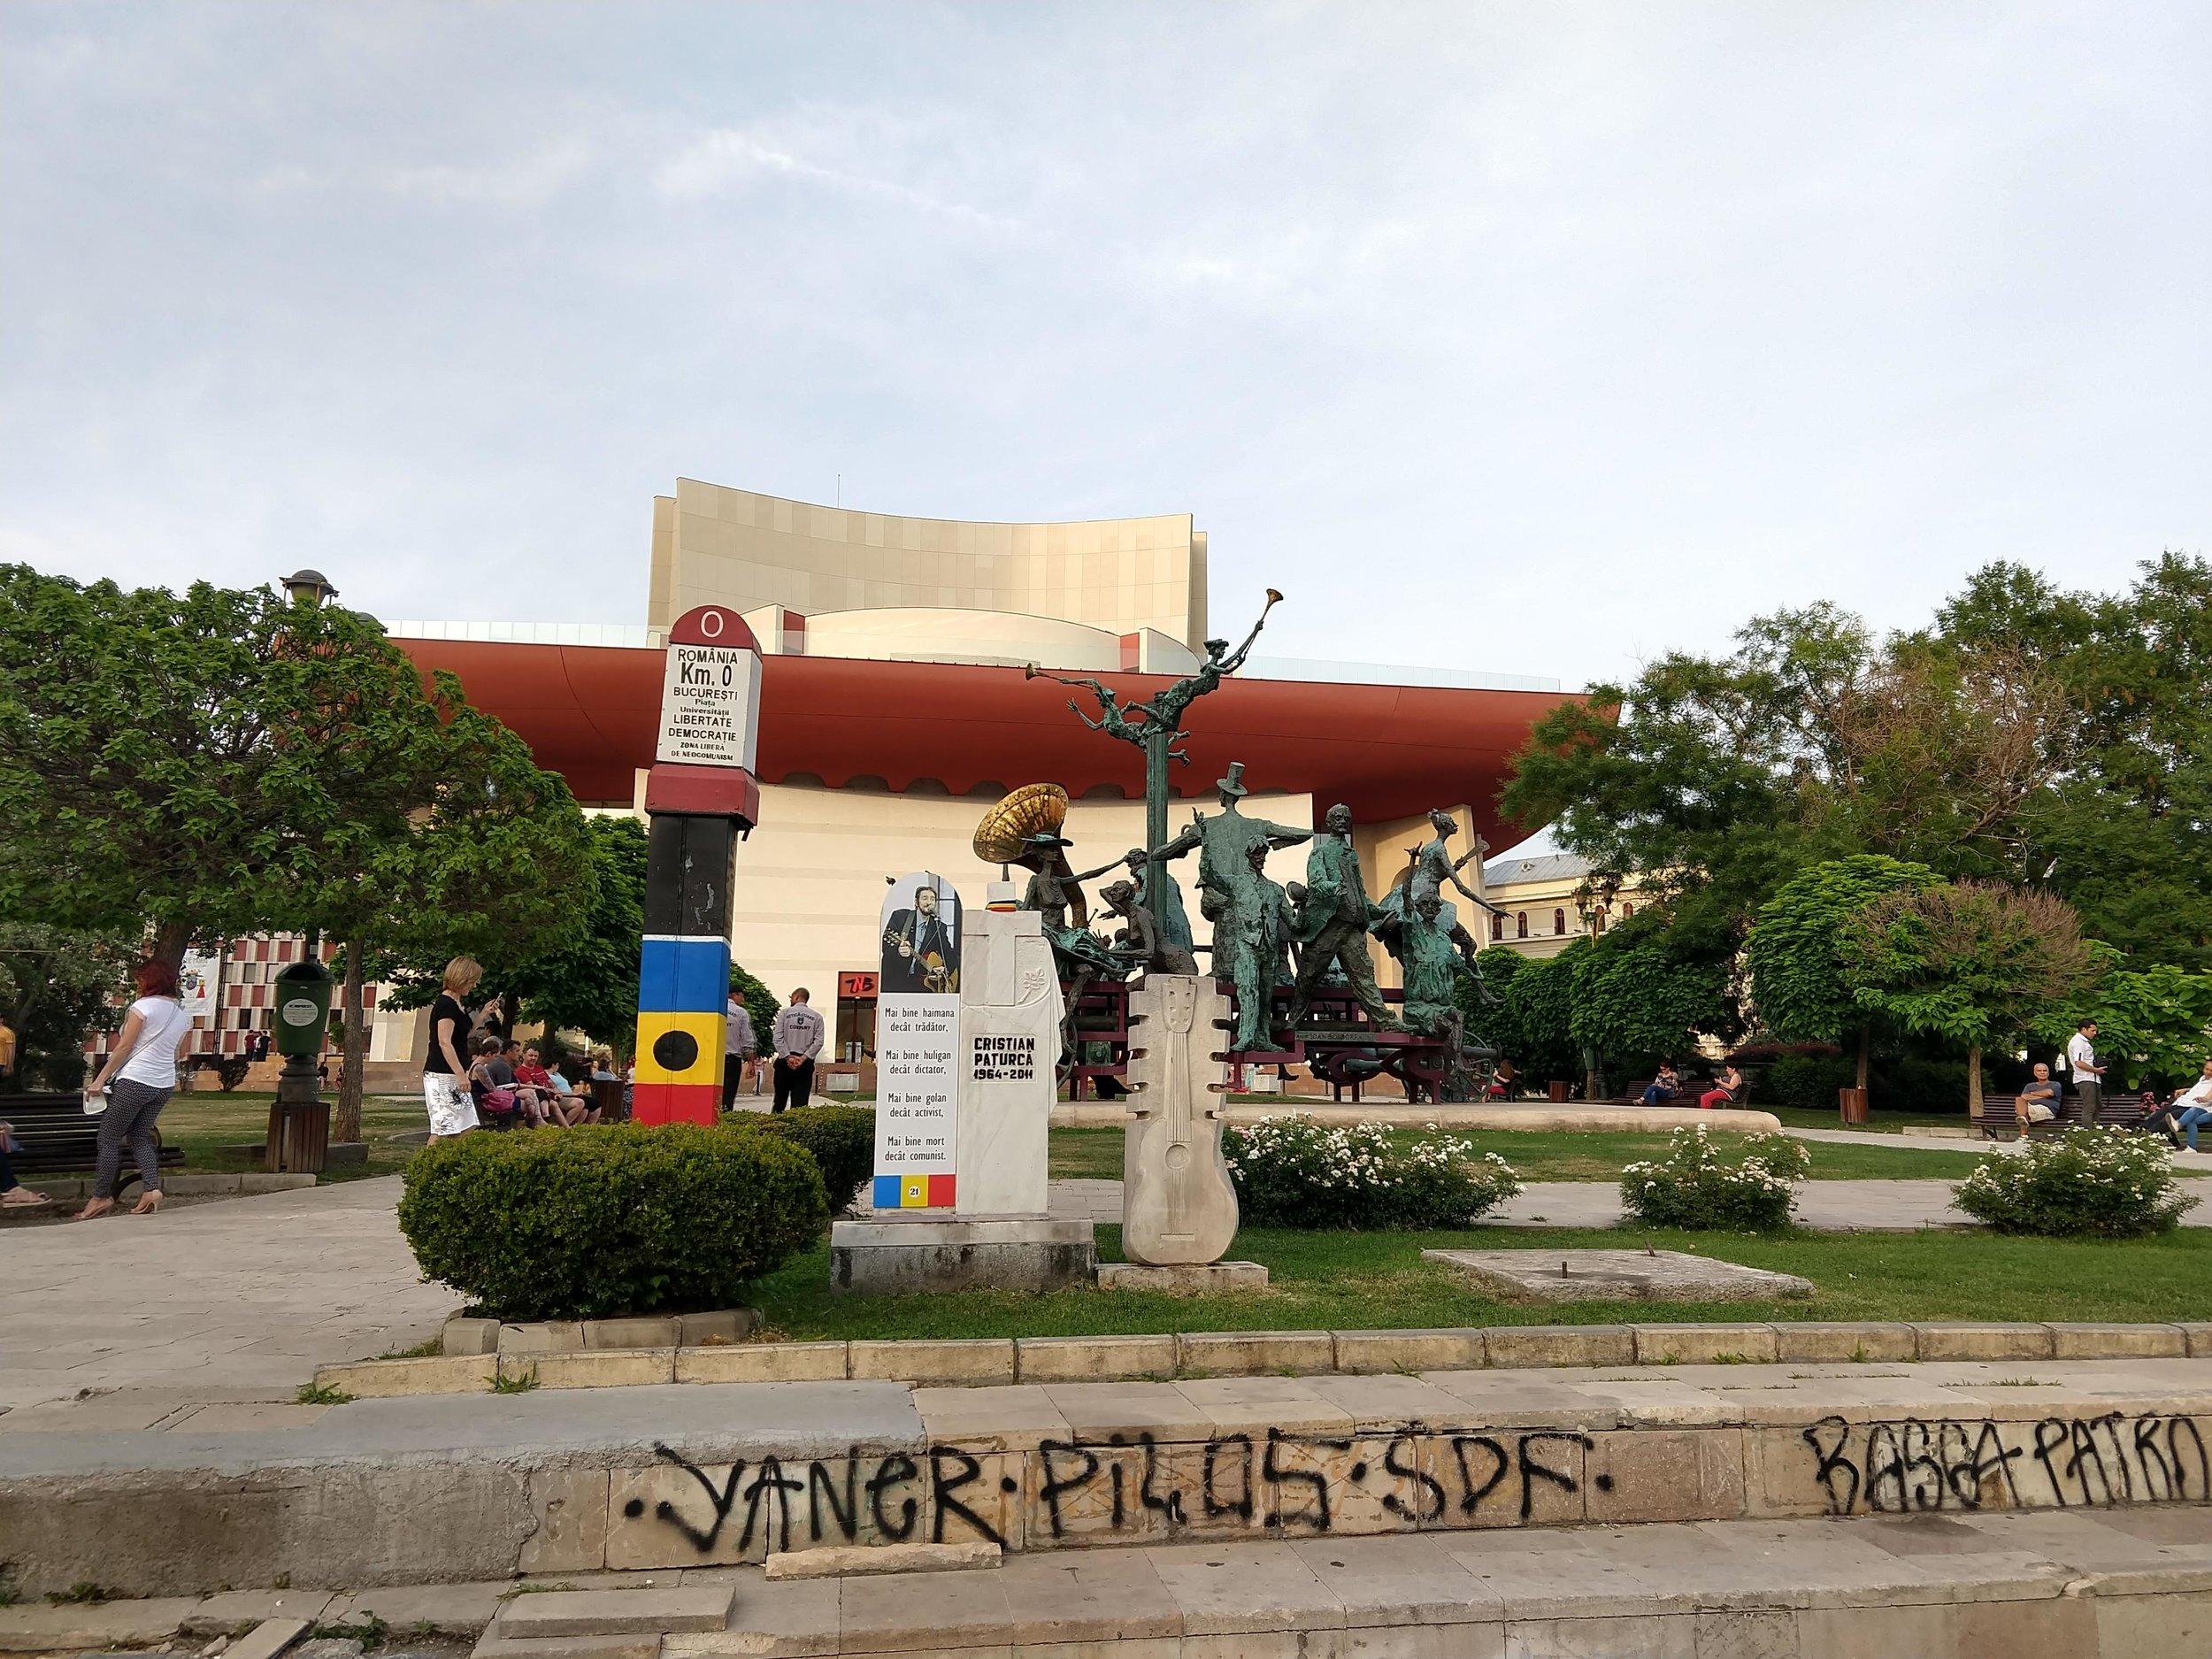 Monument and art sculptures near the site of Bucharest's kilometre zero.